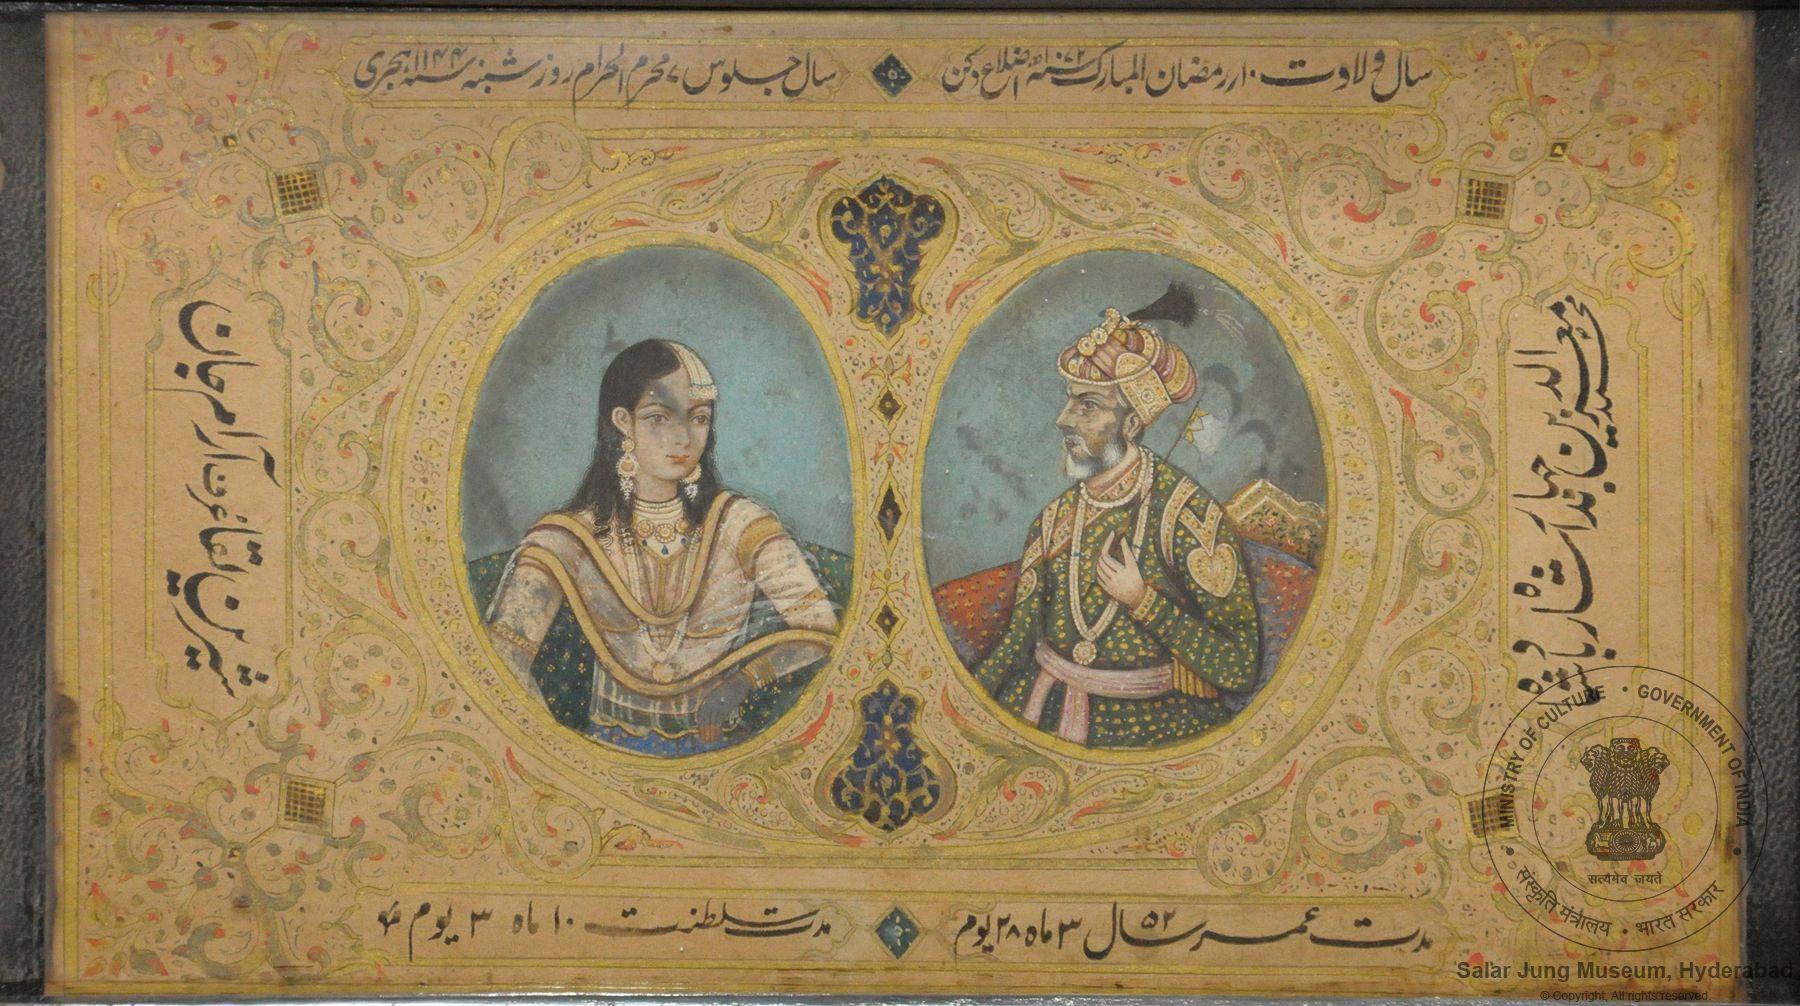 Jahandar Shah Lal Kunwar Mughal Paintings Miniature Portraits Miniature Painting